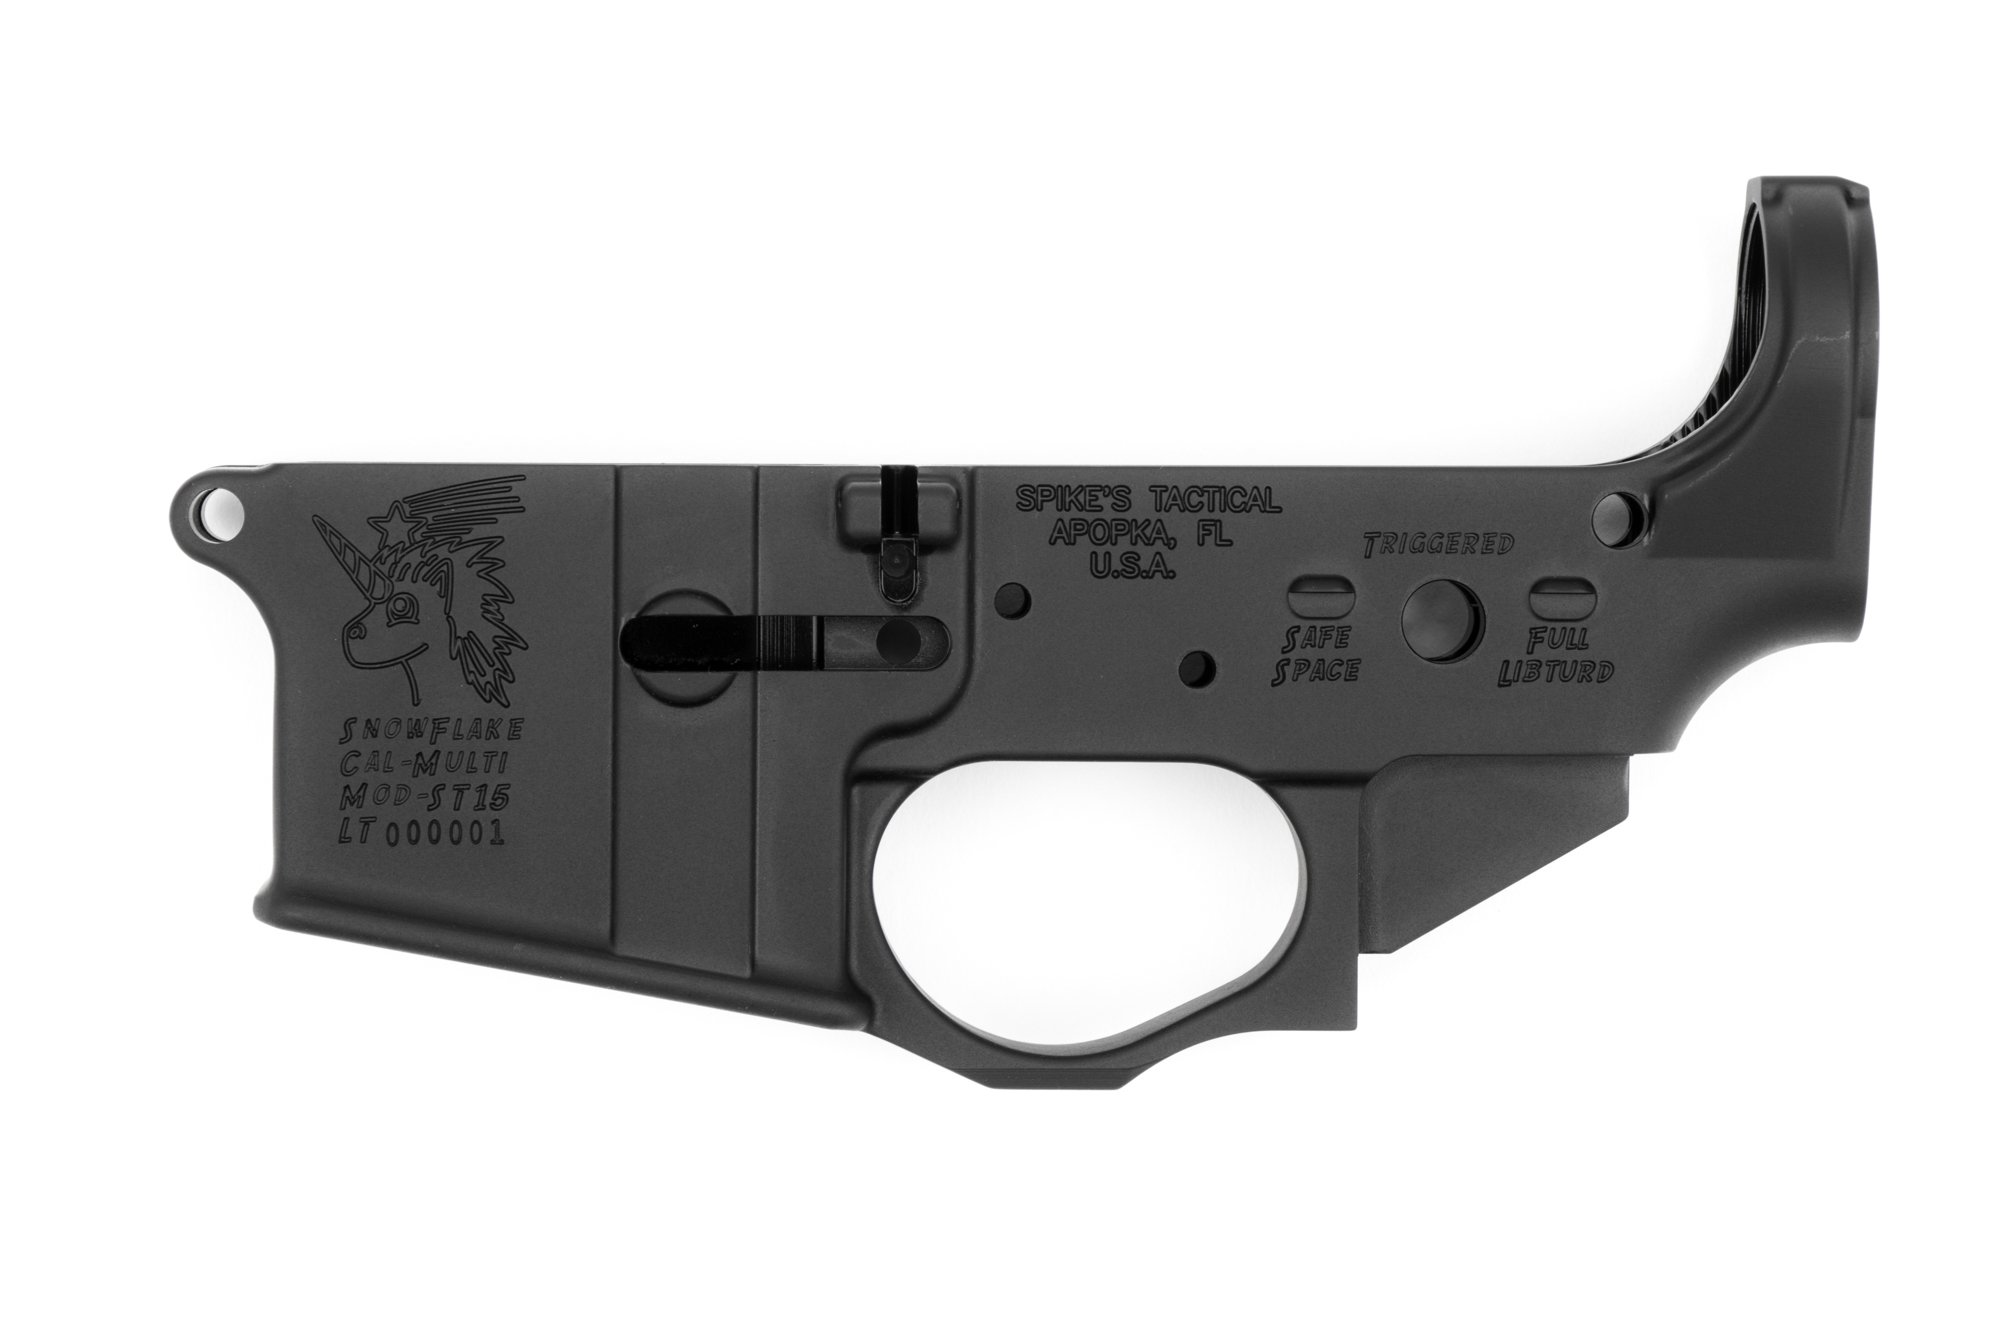 SPK-STLS030